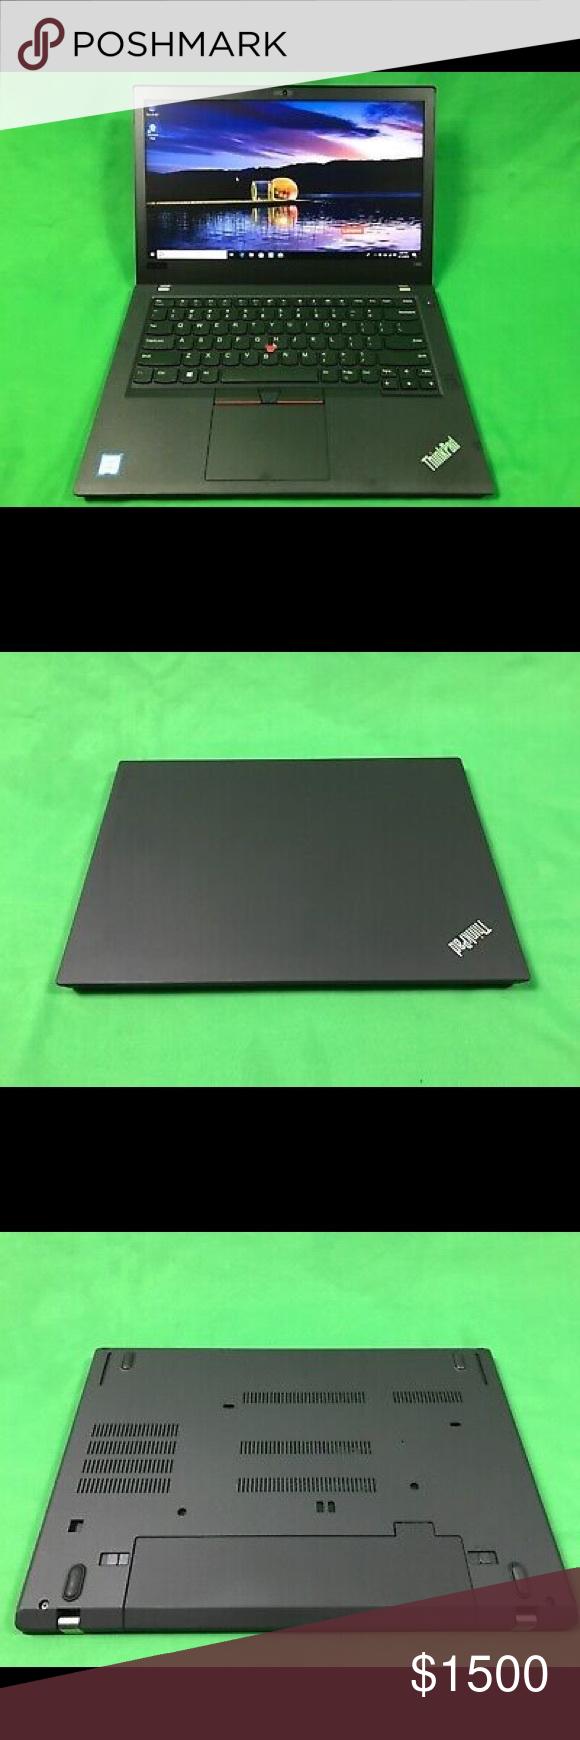 Lenovo Thinkpad T480s i5-8350U 16GB DDR4 256GB SSD Lenovo